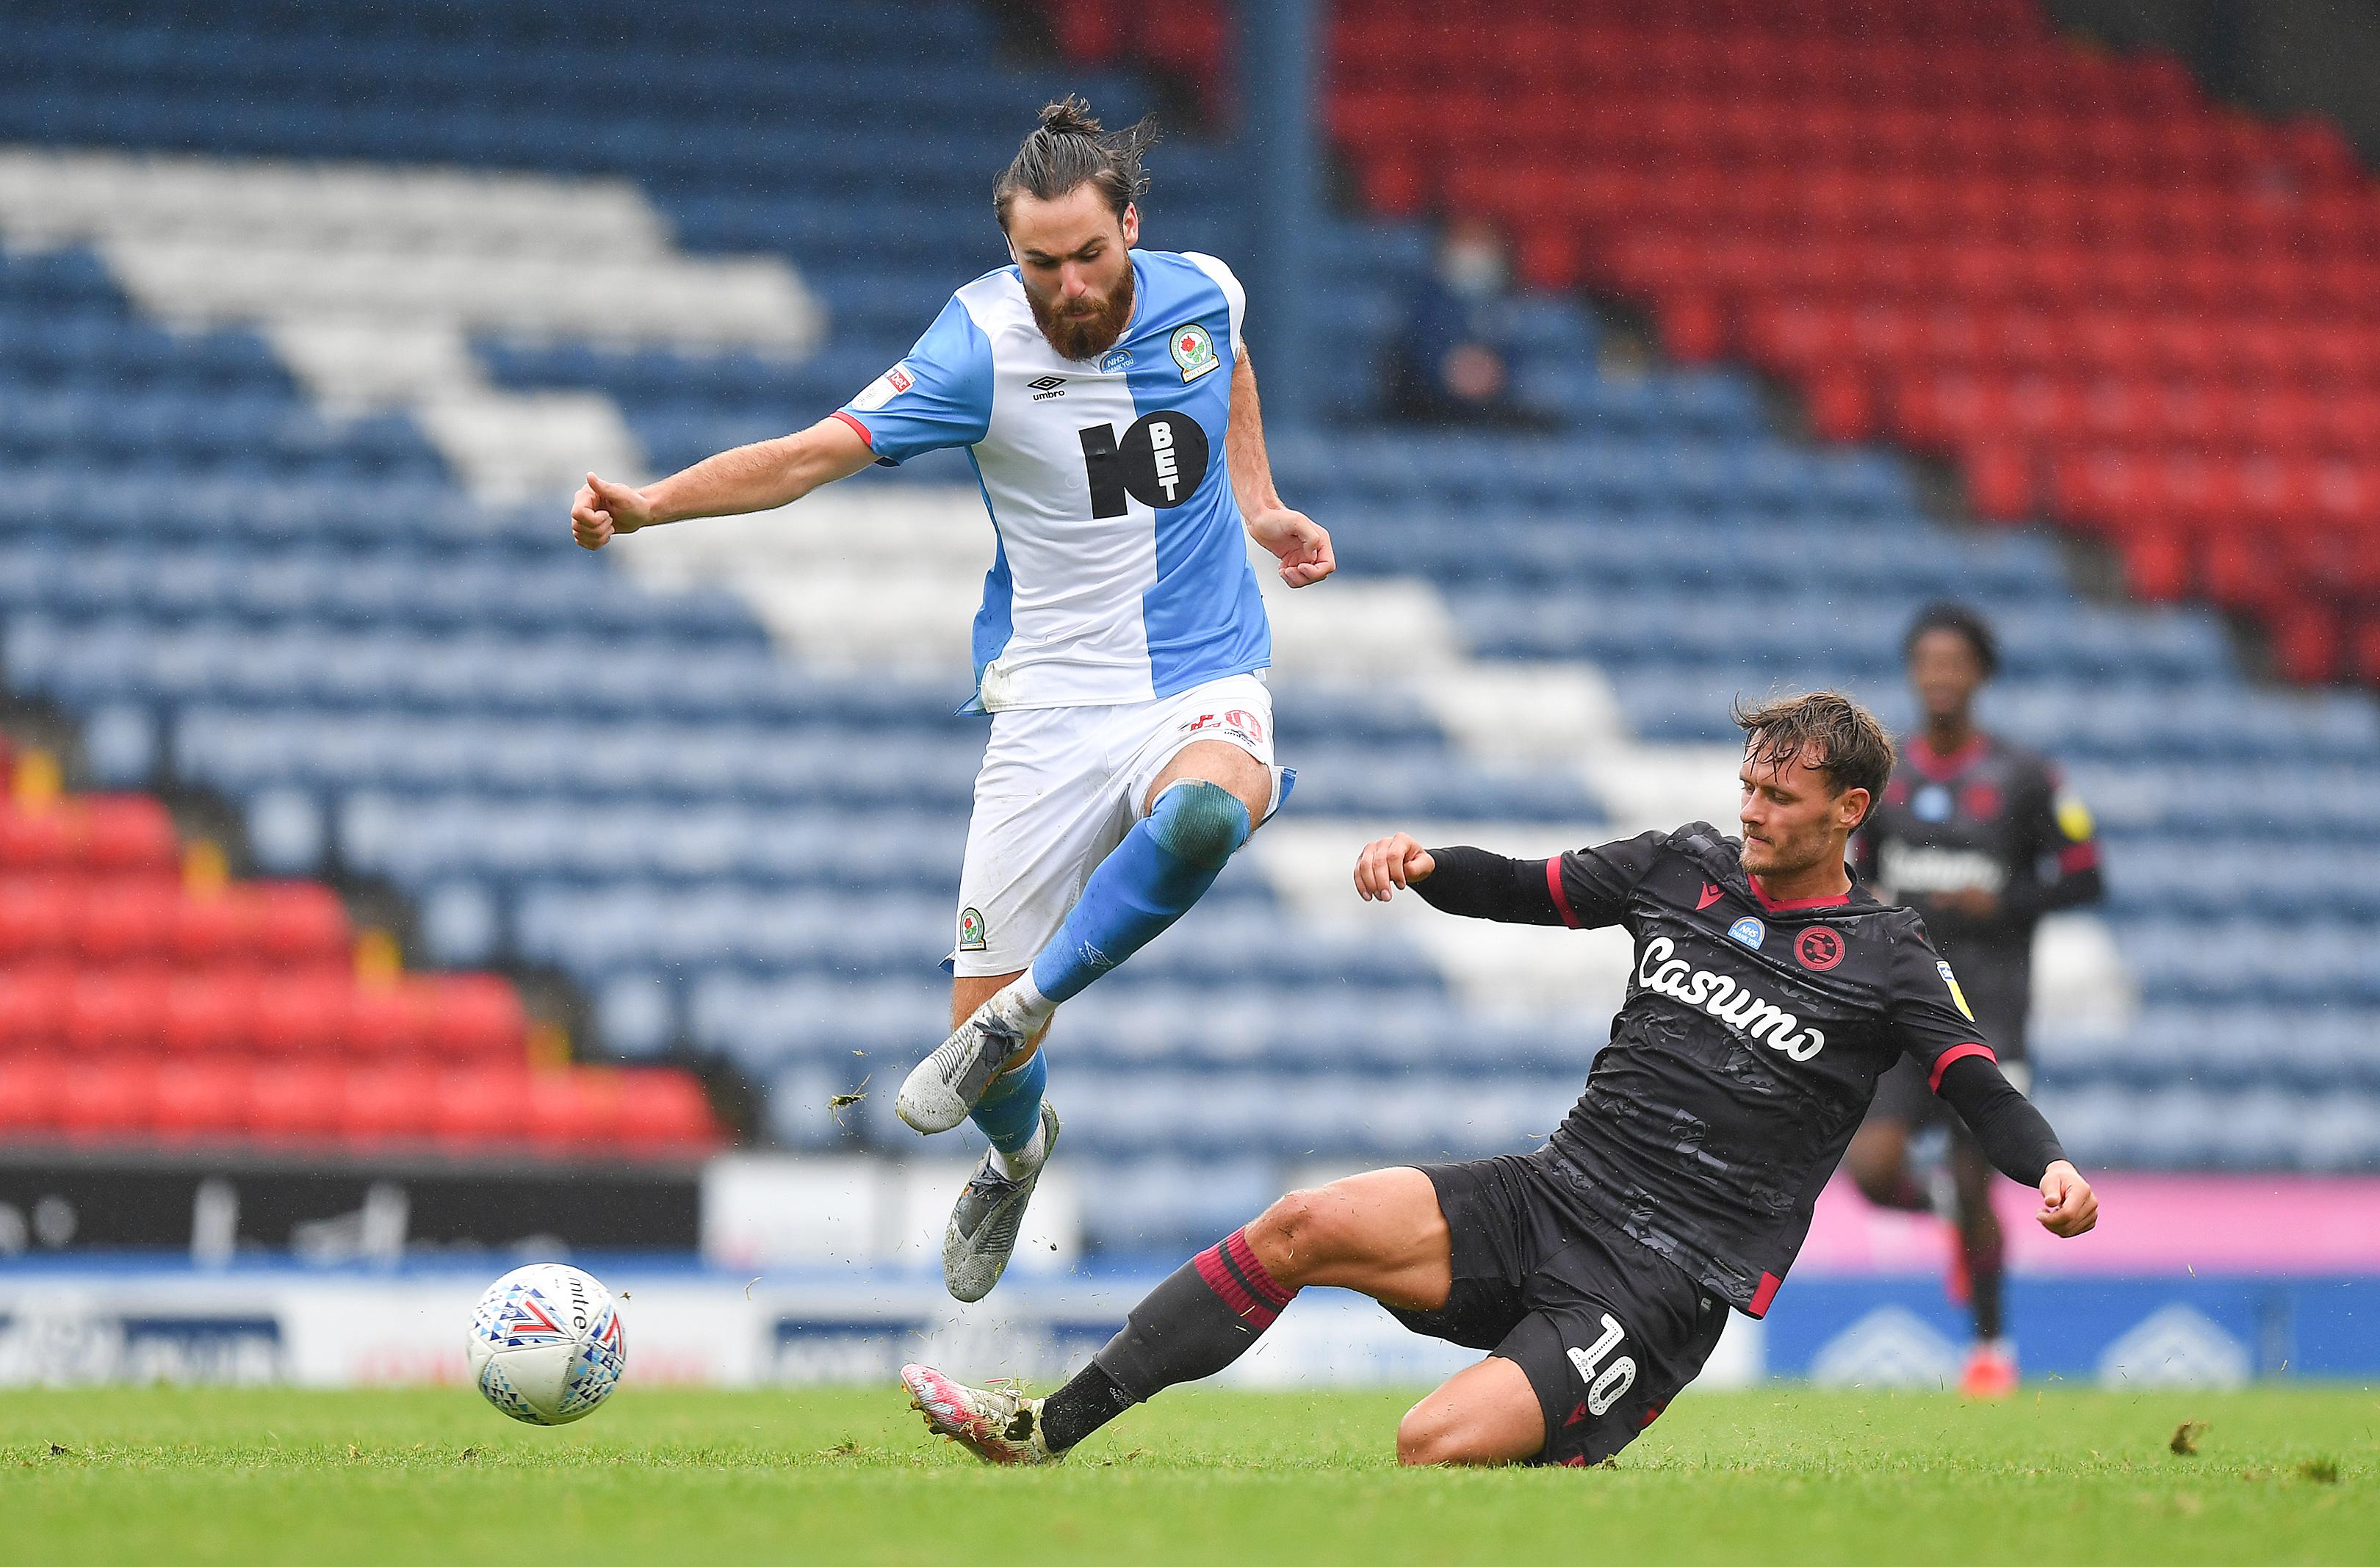 Blackburn Rovers v Reading - Sky Bet Championship